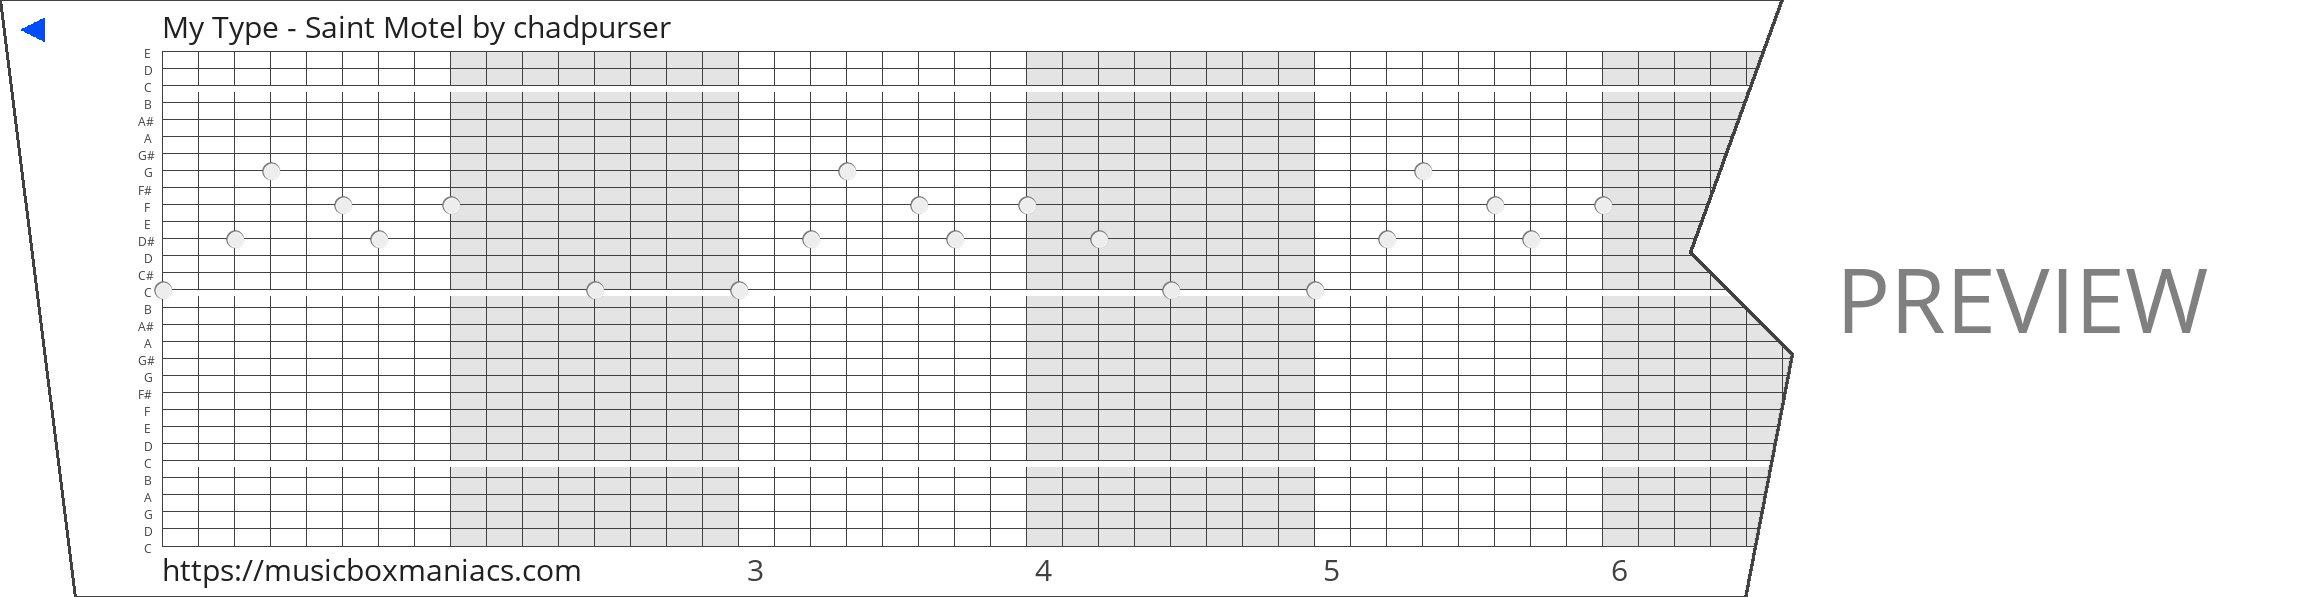 My Type - Saint Motel 30 note music box paper strip